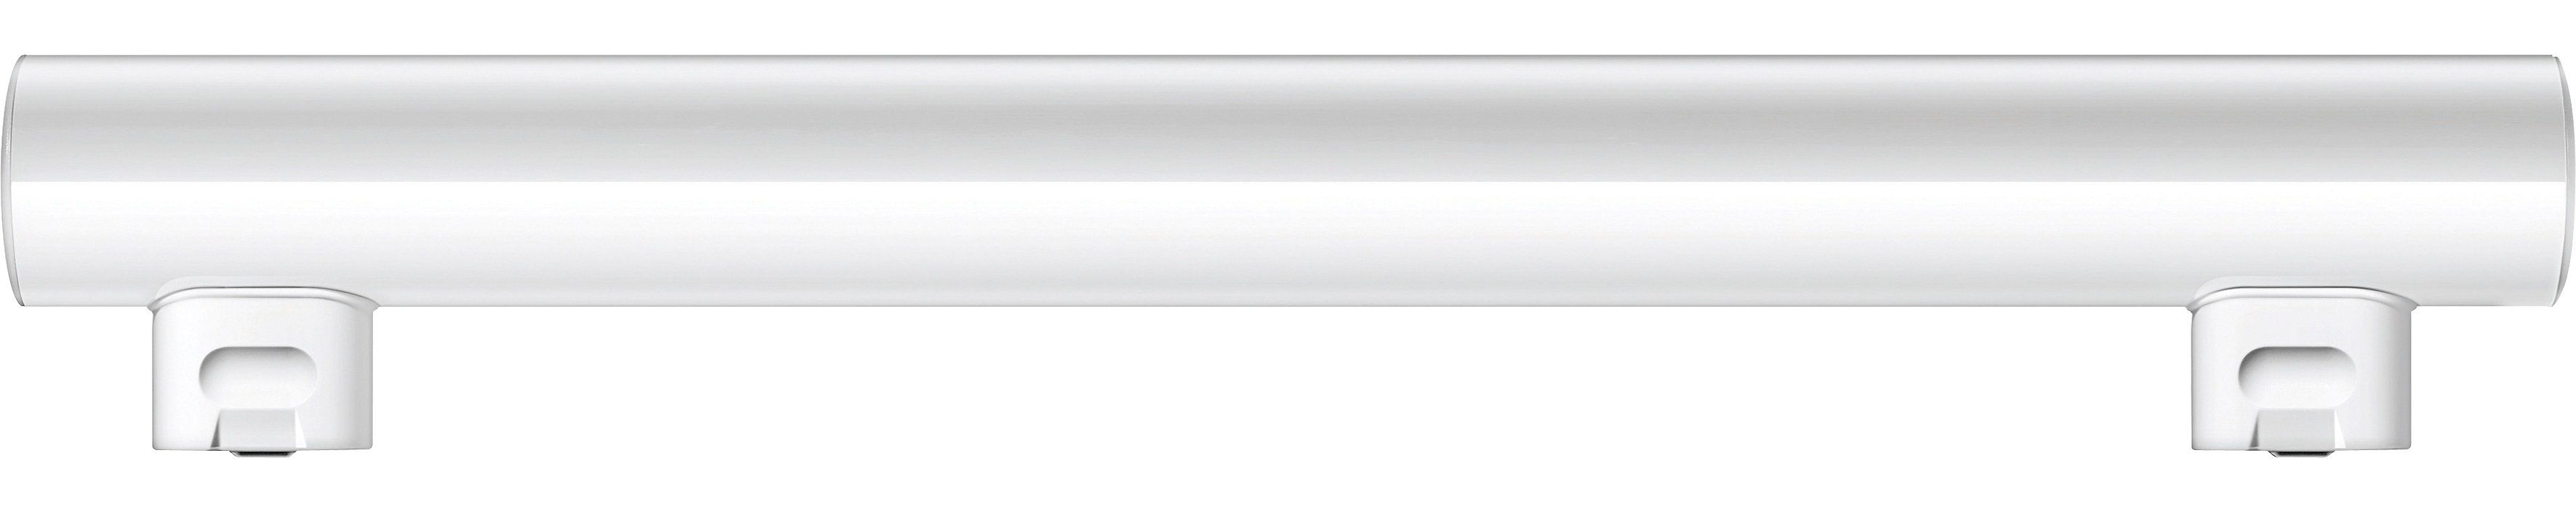 The new generation of energy-saving tube lighting